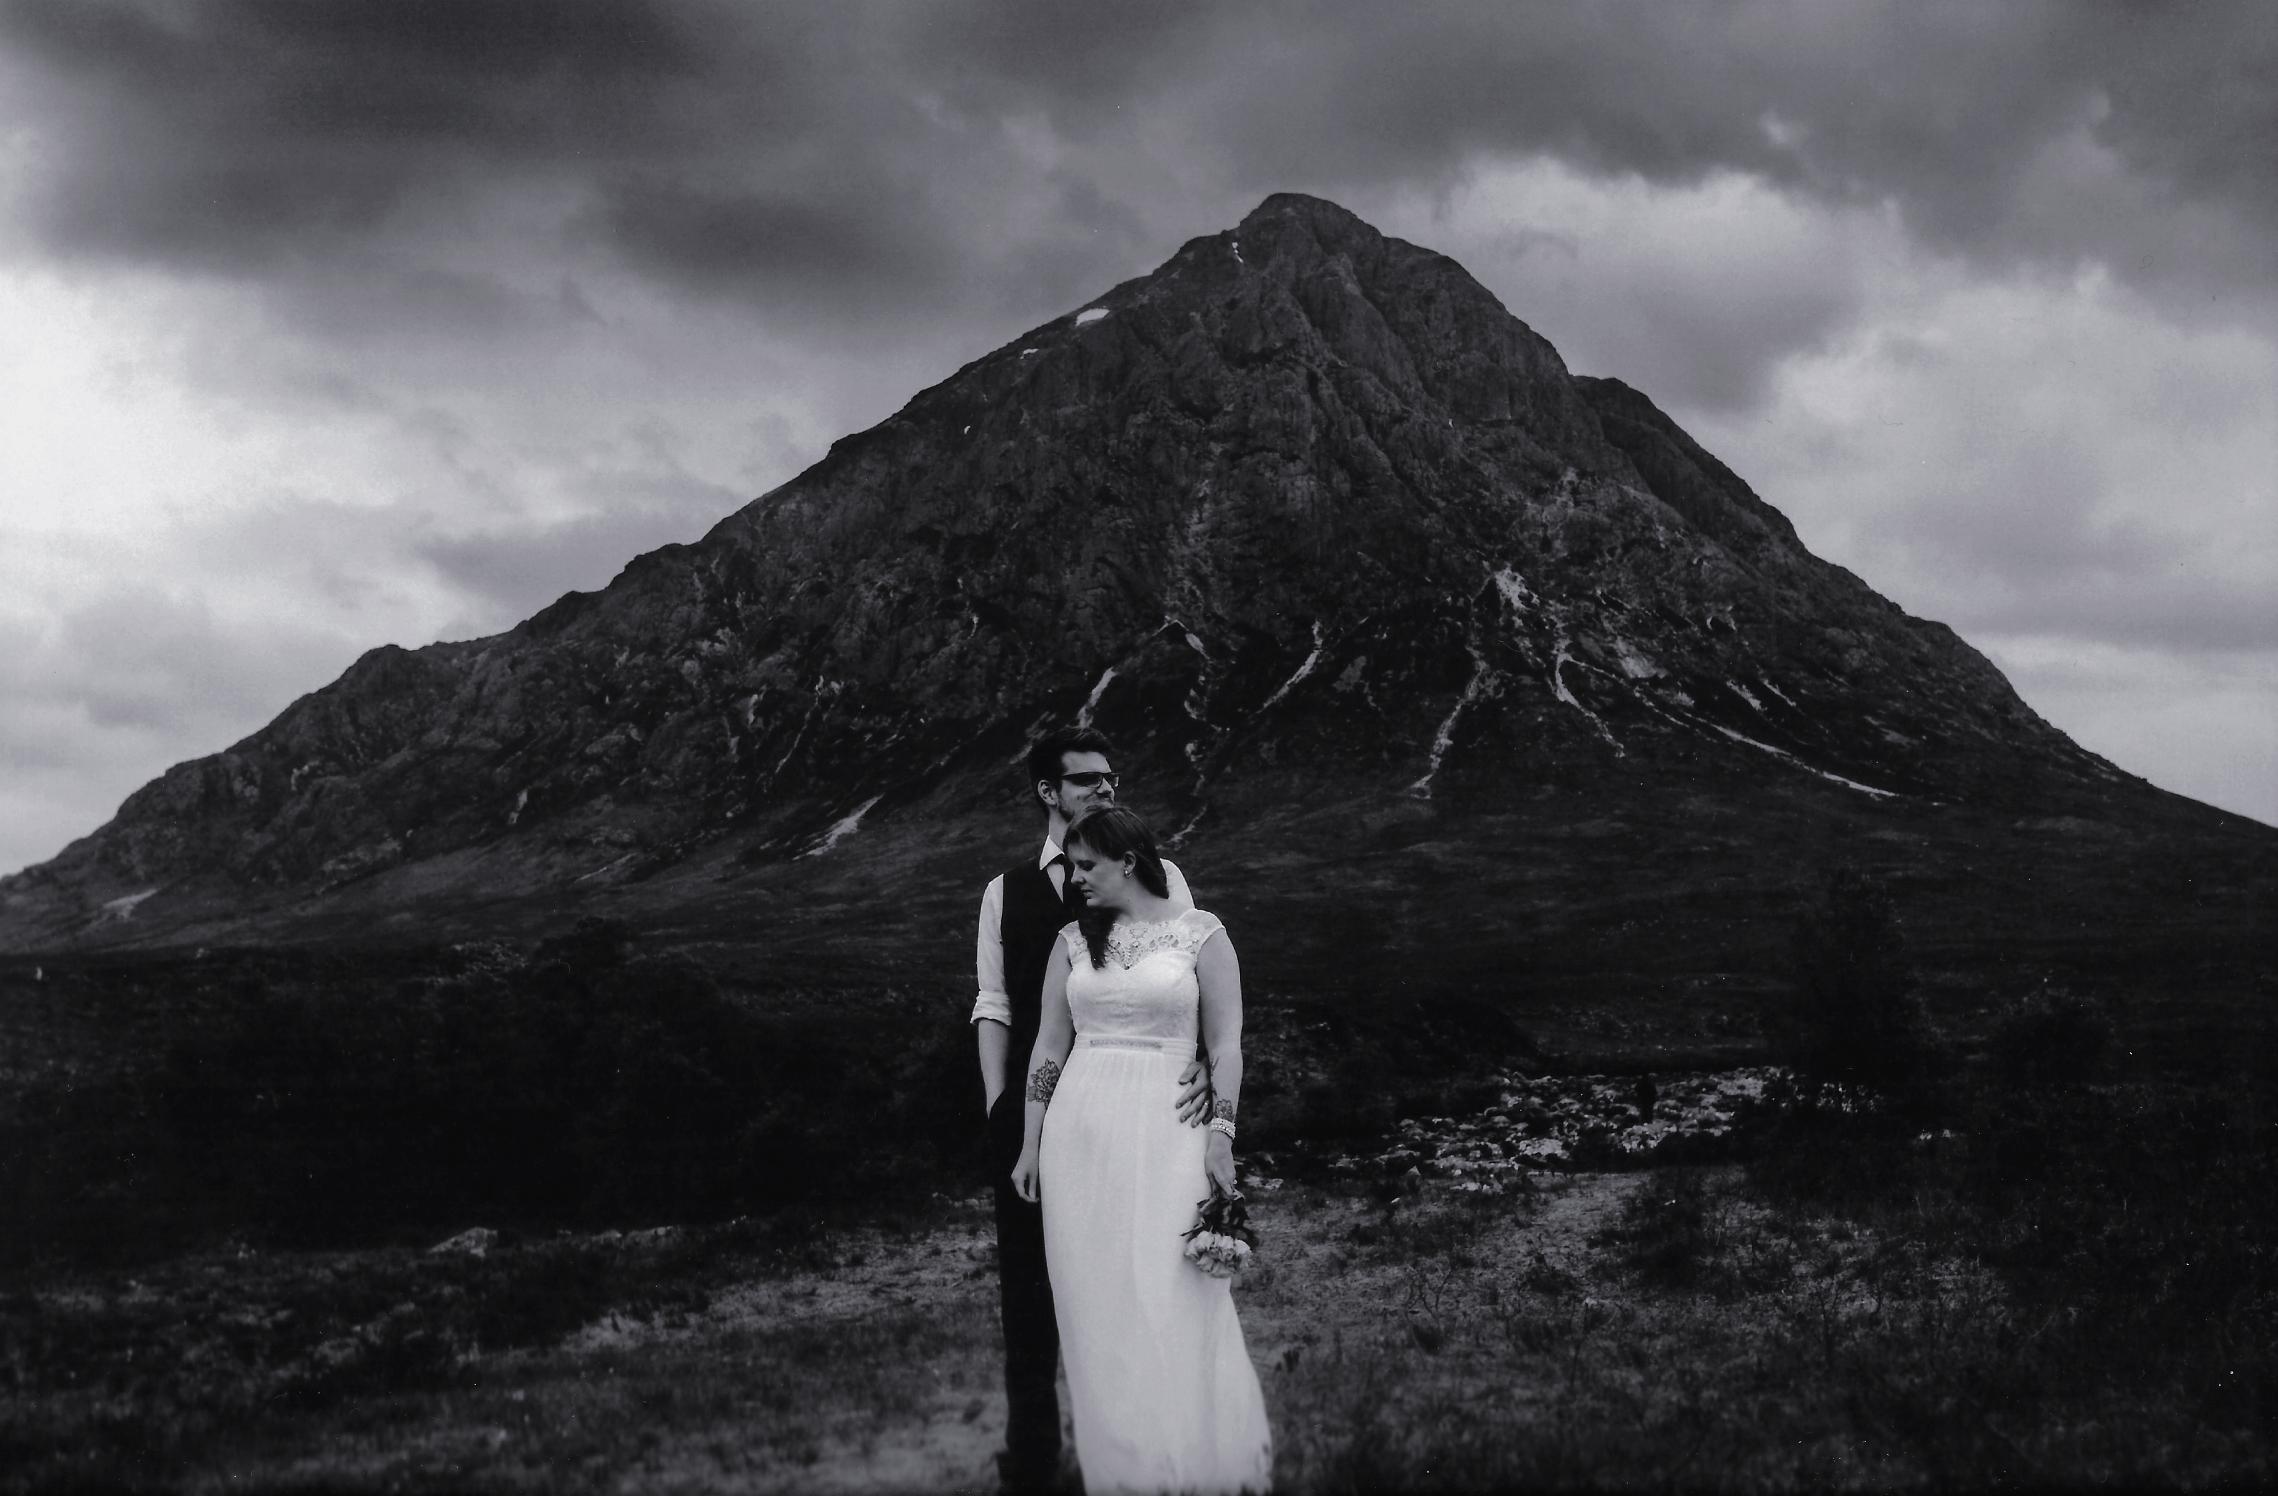 Where to print your wedding photos Boots photo print